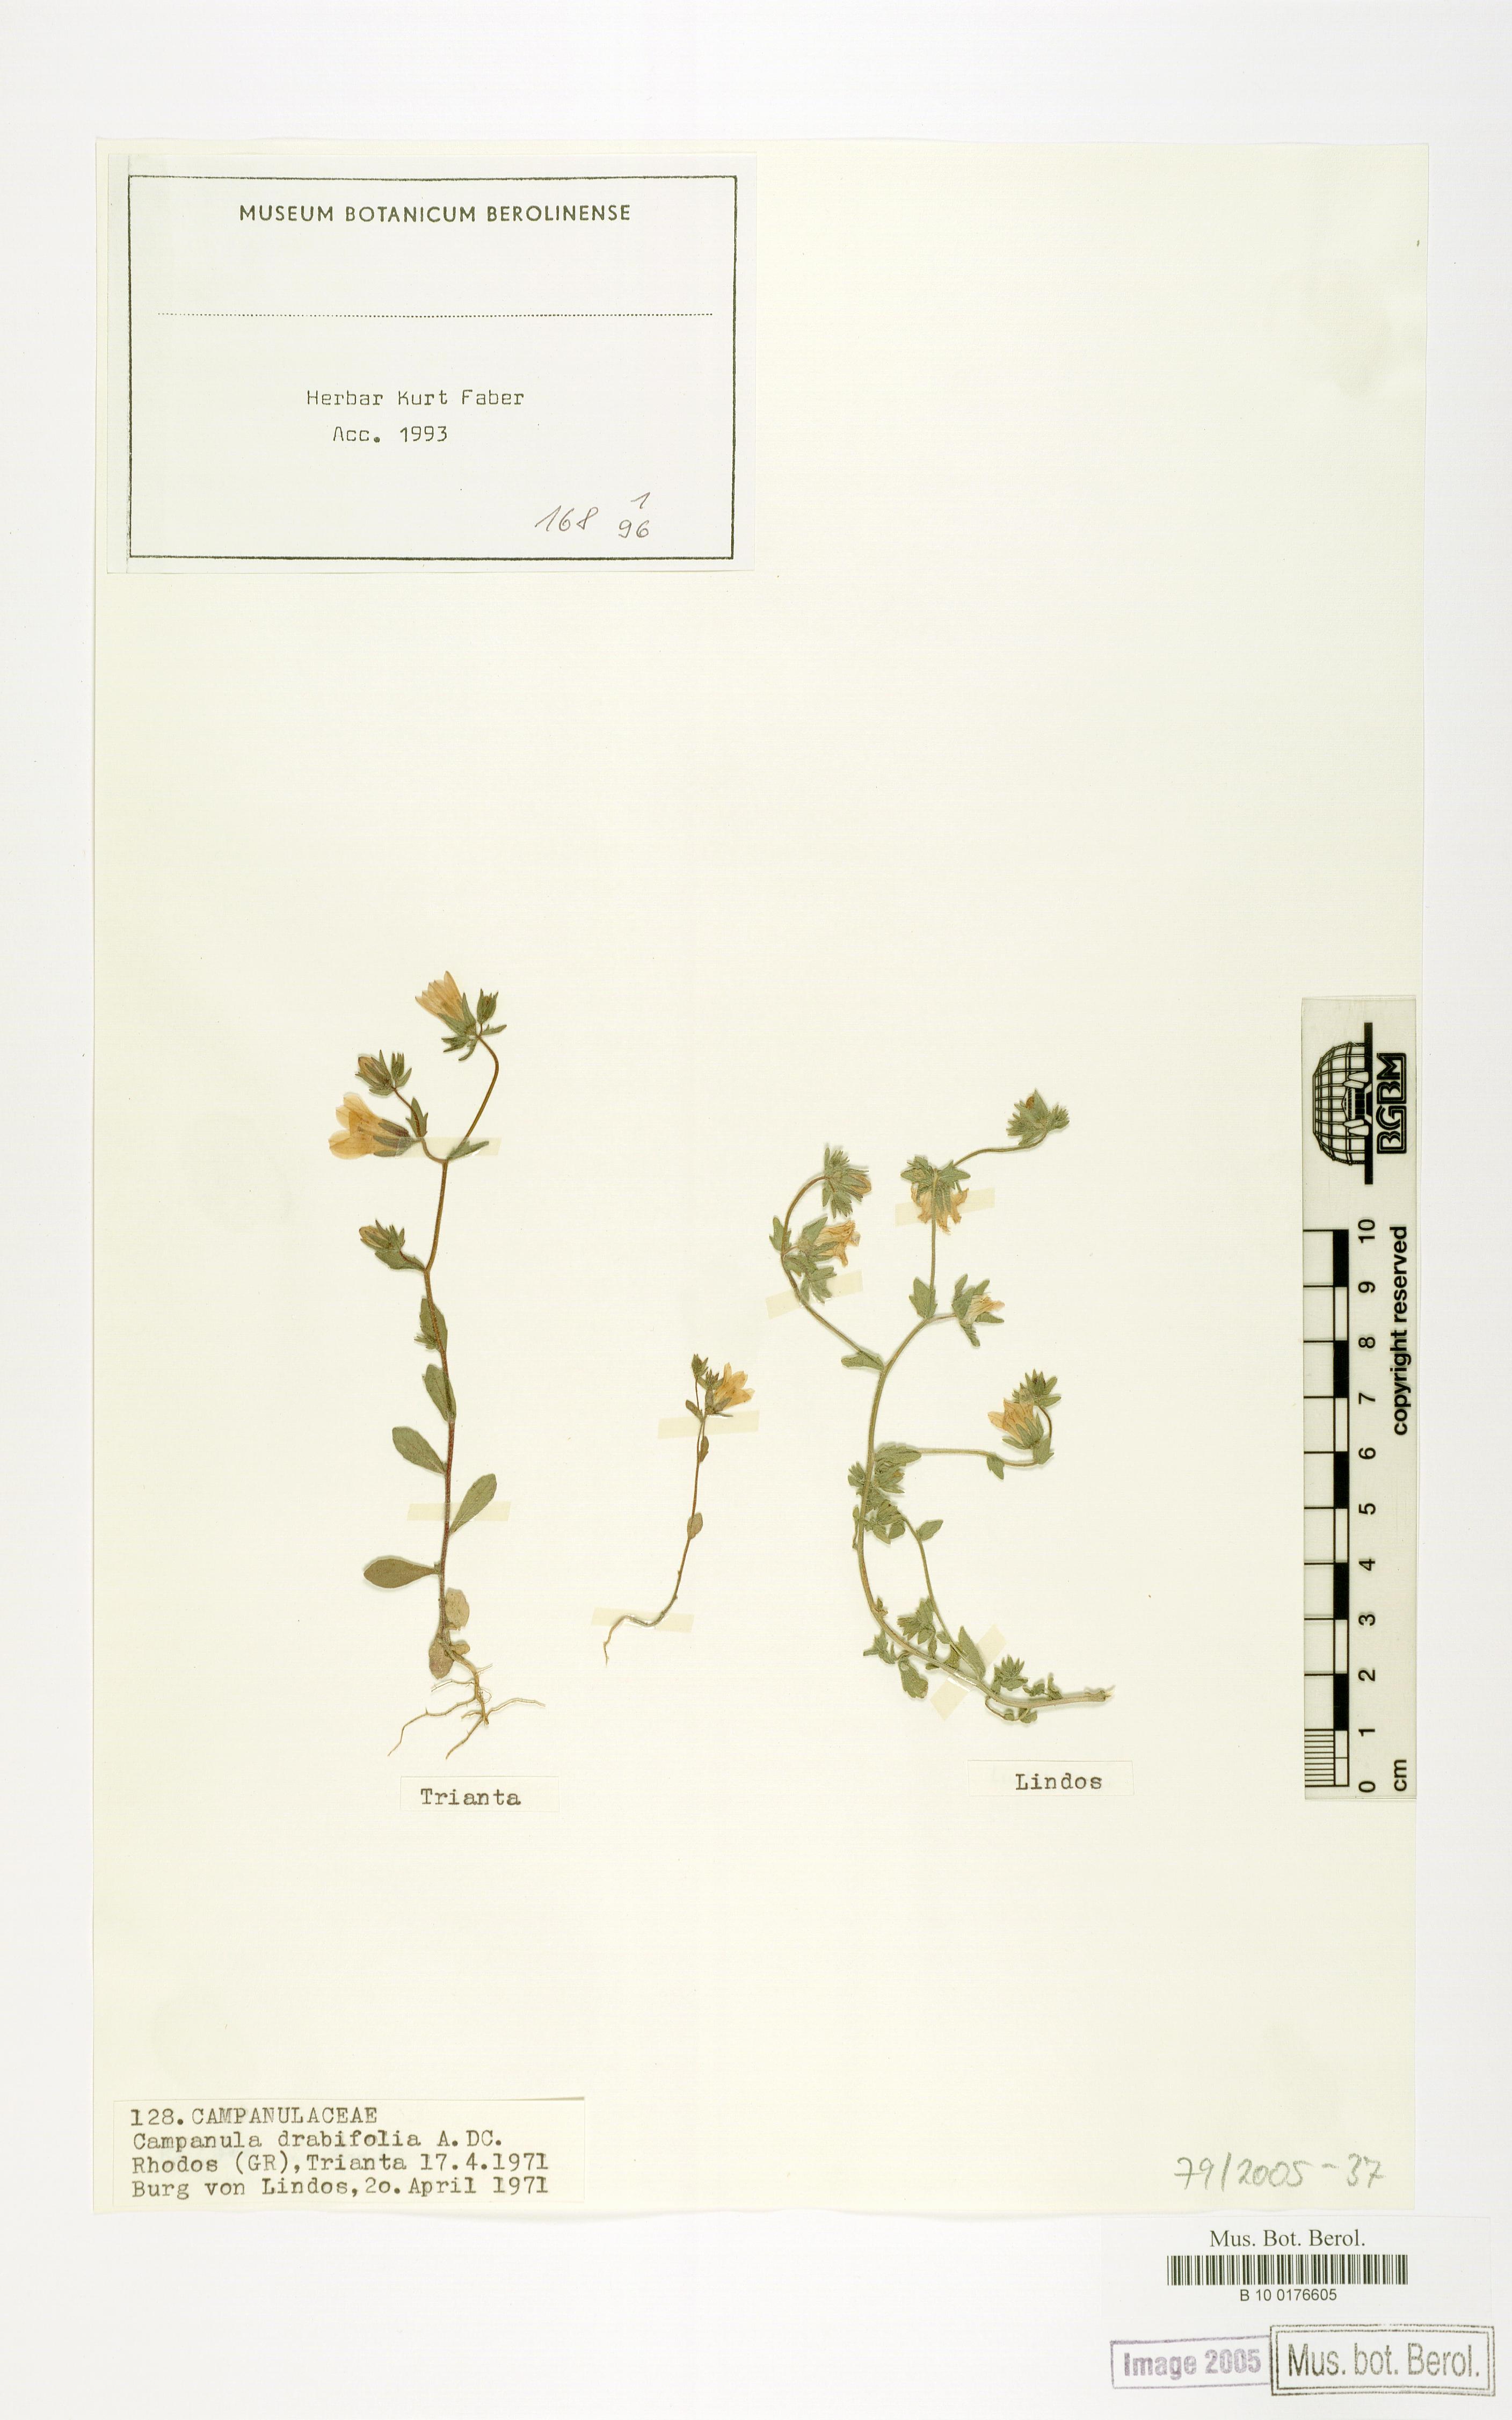 http://ww2.bgbm.org/herbarium/images/B/10/01/76/60/B_10_0176605.jpg